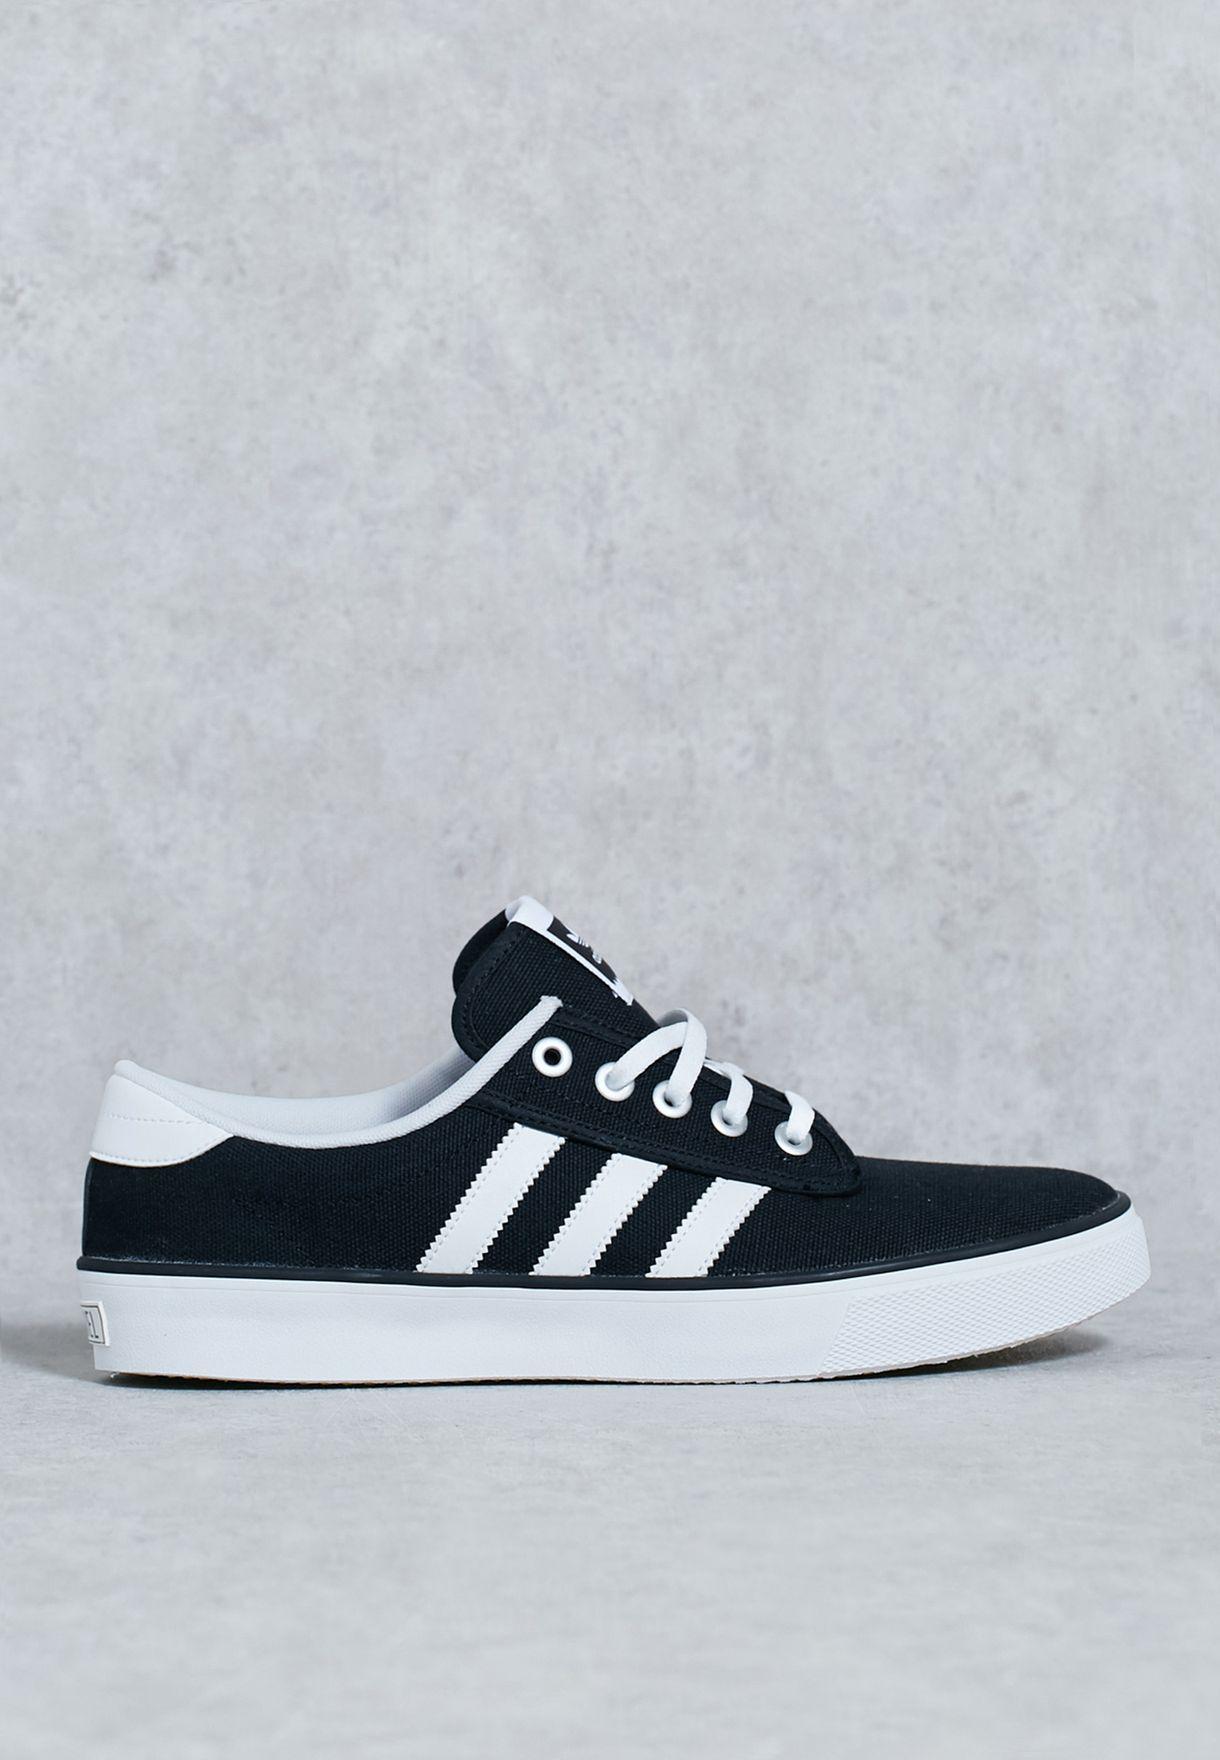 adidas kiel shoes grey